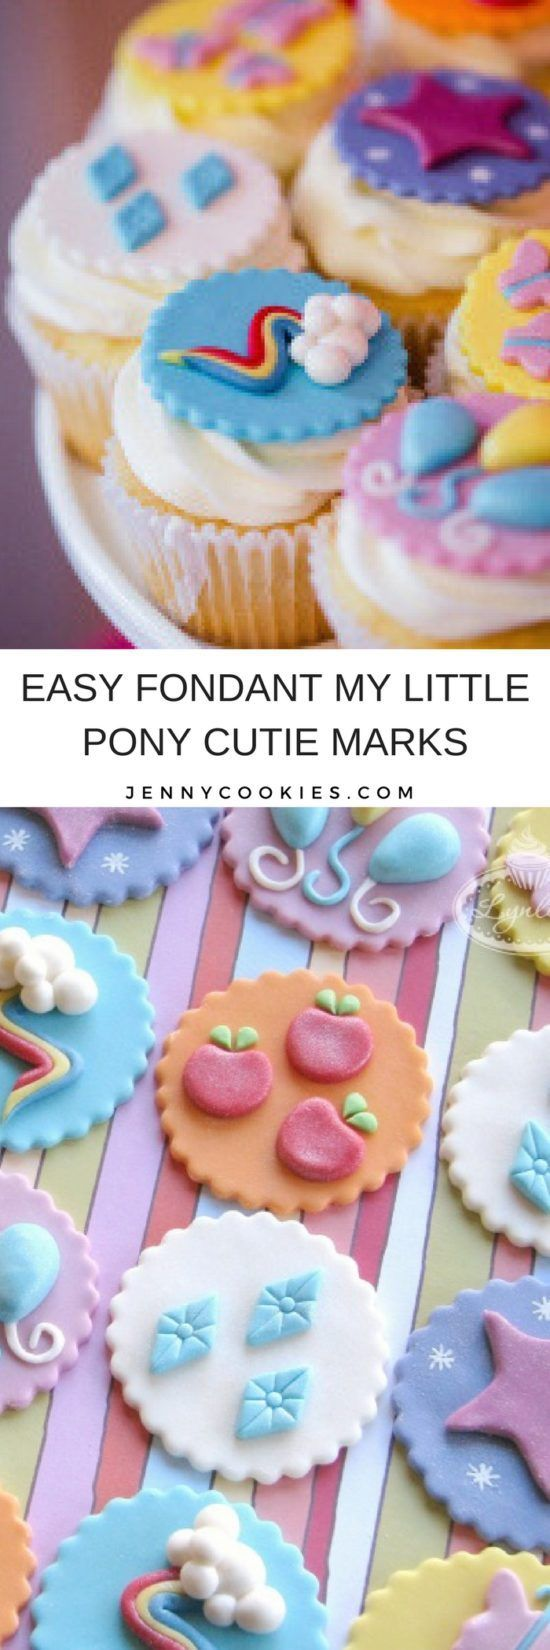 My Little Pony Cutie Mark Fondant Tutorial | fondant tutorial | My Little Pony cupcake decor | decorate with fondant | step by step fondant tutorial | how to decorate cupcakes with fondant || JennyCookies.com #fondant #mylittlepony #cupcakedecor